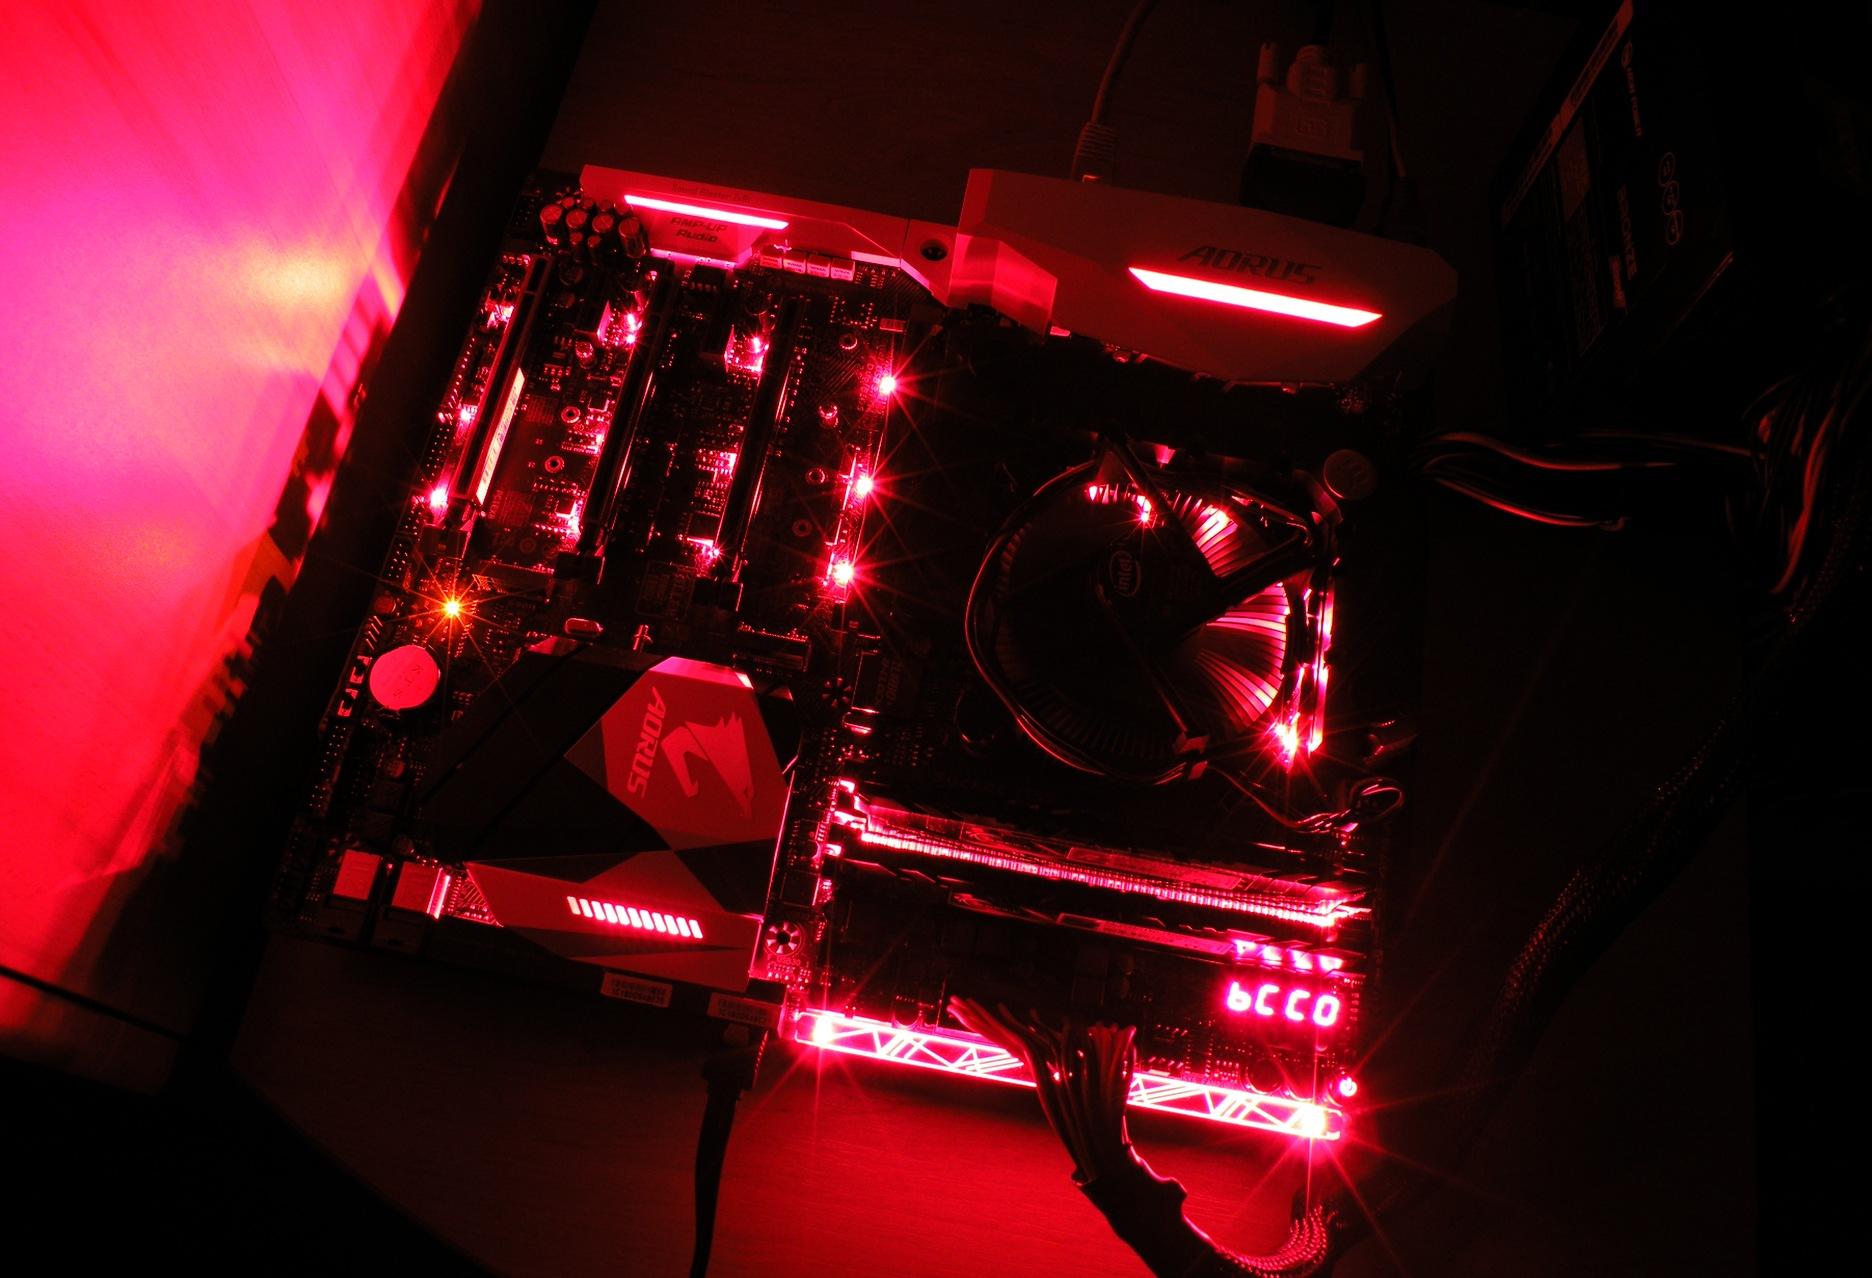 Gigabyte Aorus GA-Z270X-Gaming 9 - RGB